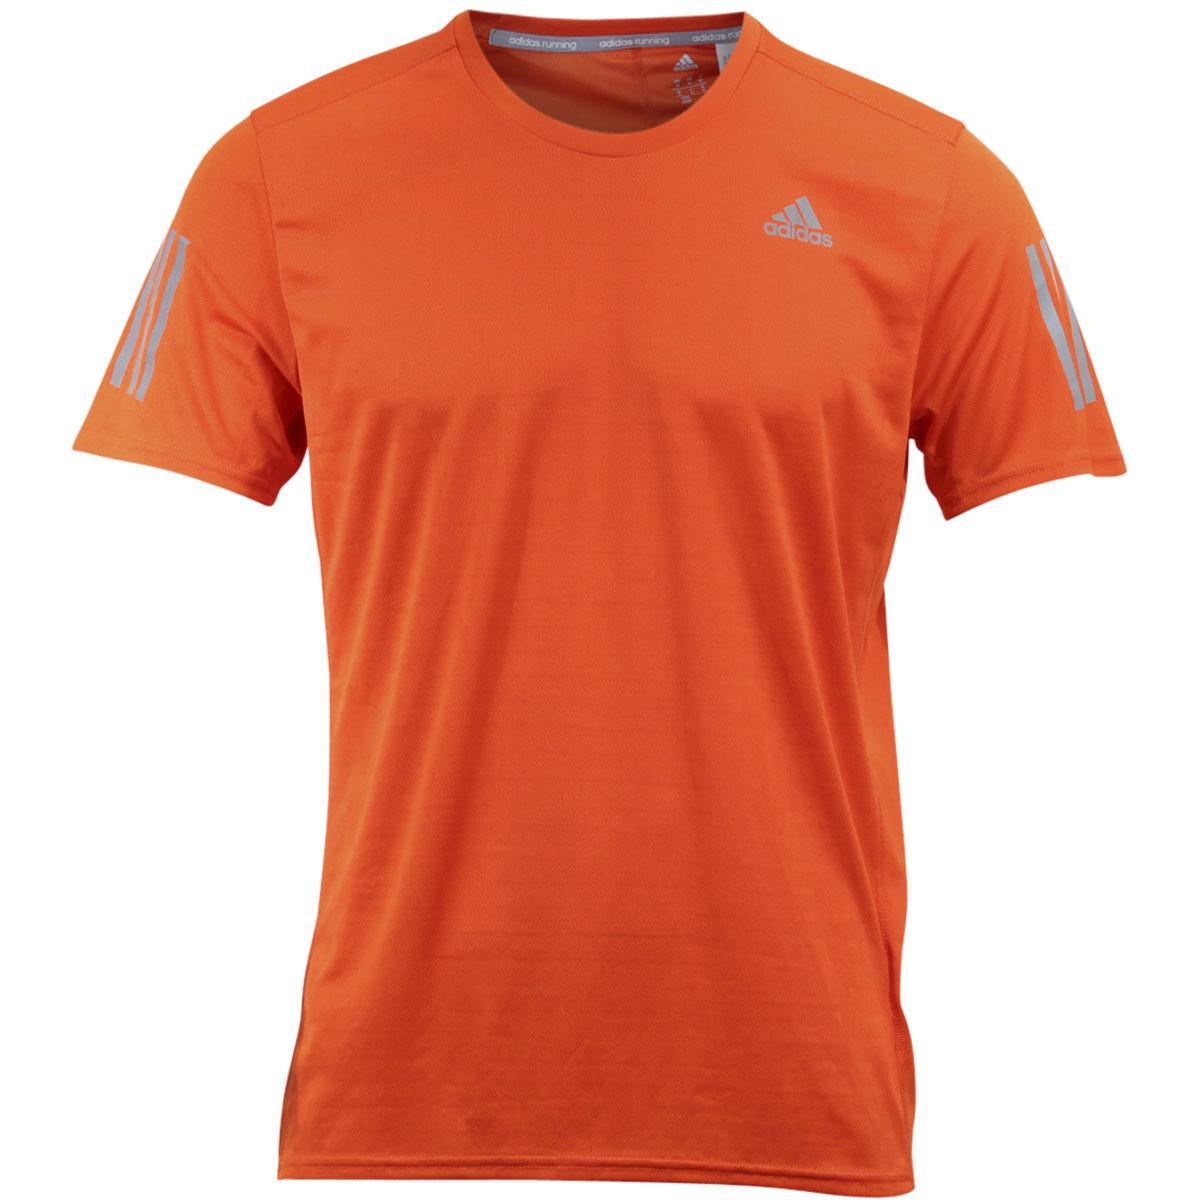 Image of Adidas Men's Response Trail Running Climacool Short Sleeve T Shirt - Energy - Small